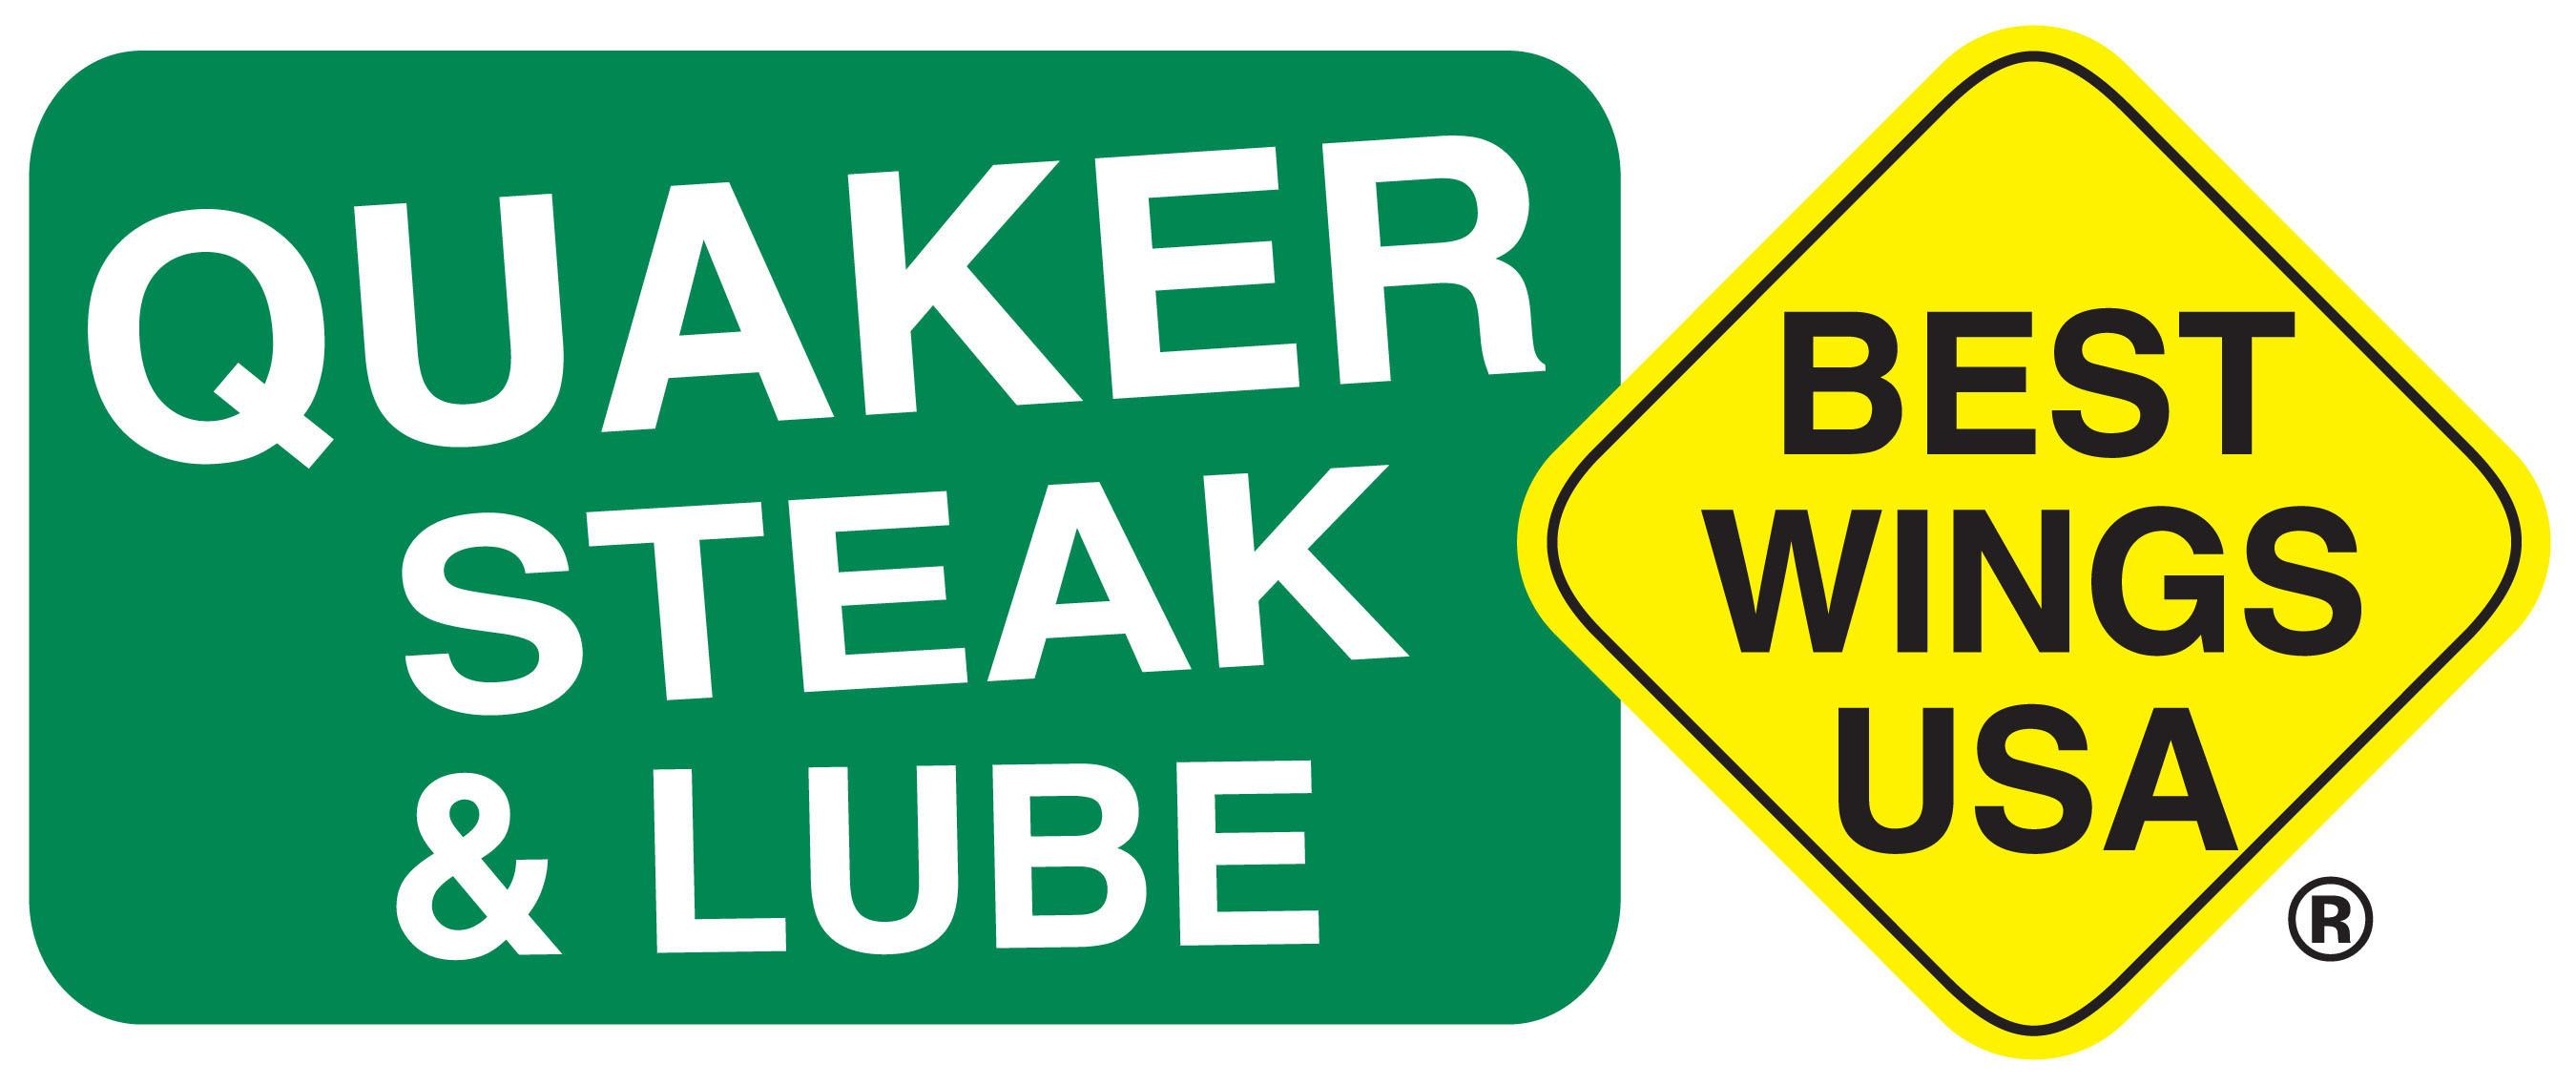 QUAKER STEAK & LUBE LOGO